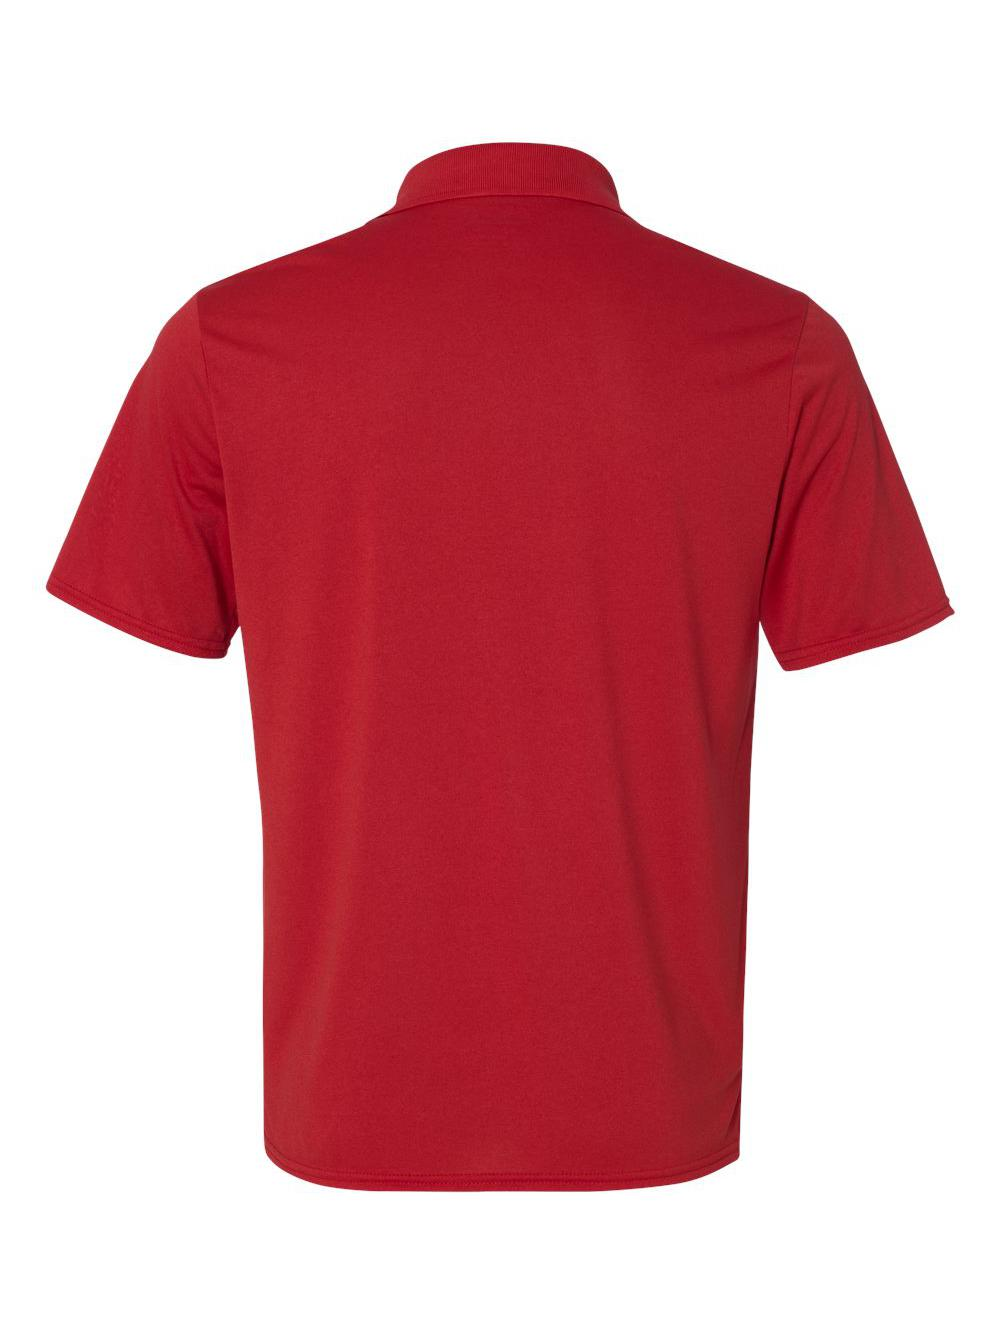 Gildan-Performance-Jersey-Sport-Shirt-44800 thumbnail 22